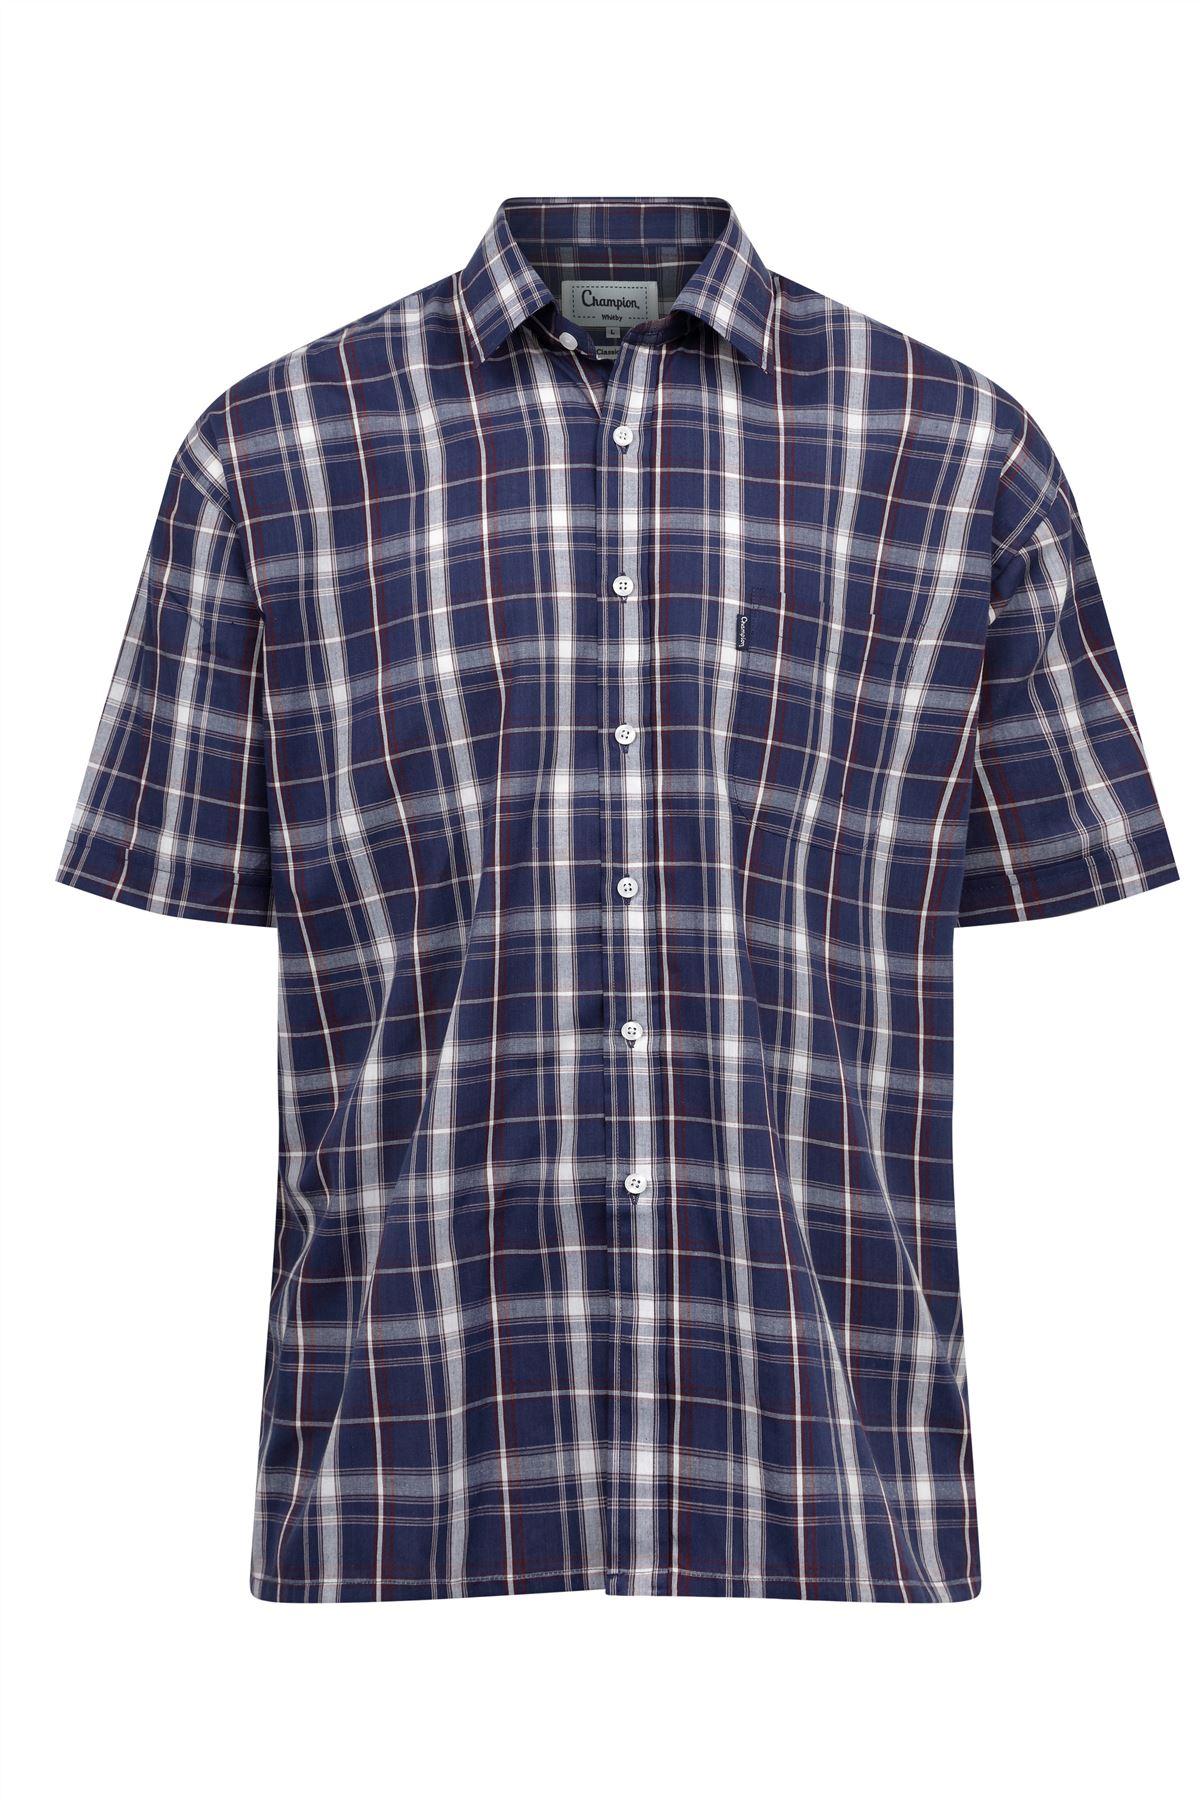 Champion-Mens-Shirt-Check-Short-Sleeve-Polycotton-Country-Casual thumbnail 8